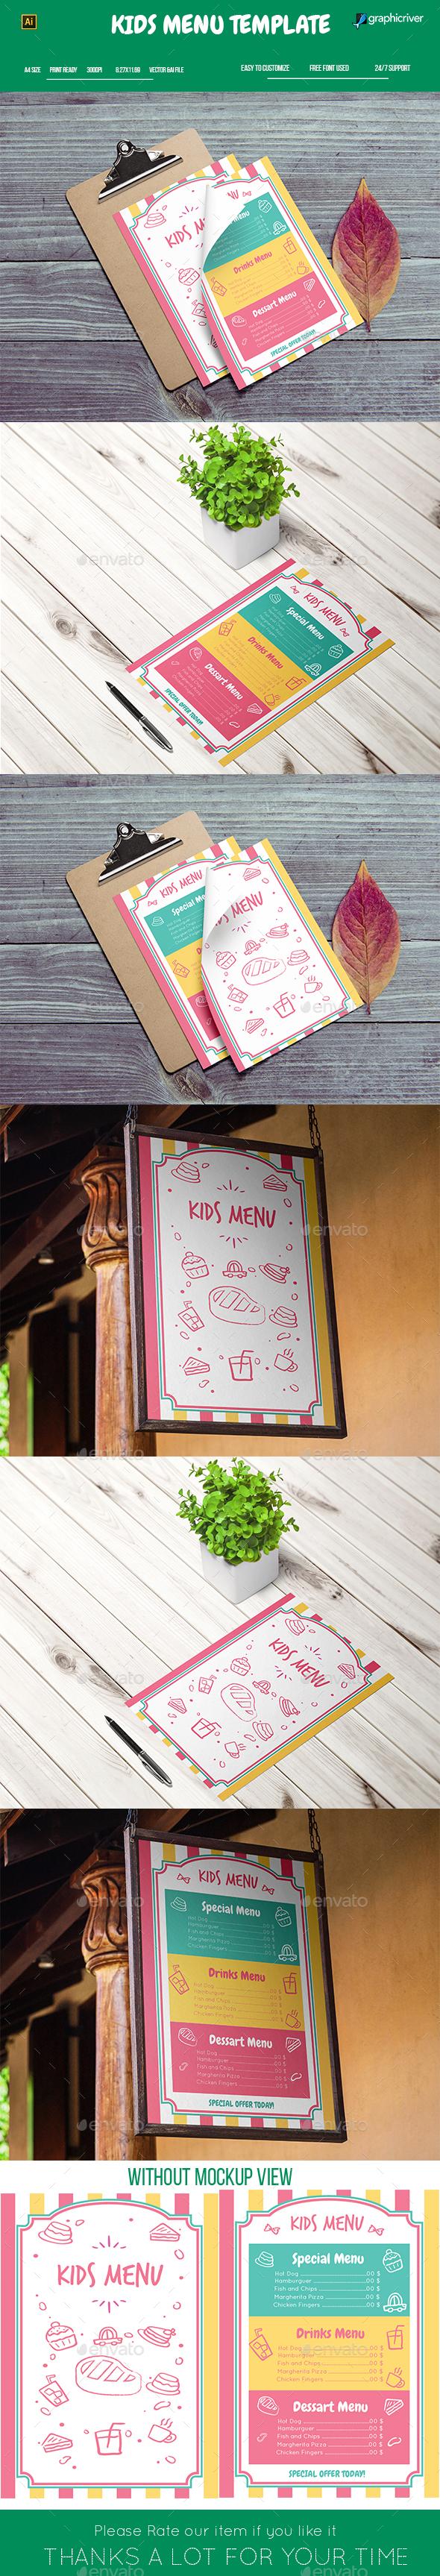 Kids Menu Template - Food Menus Print Templates